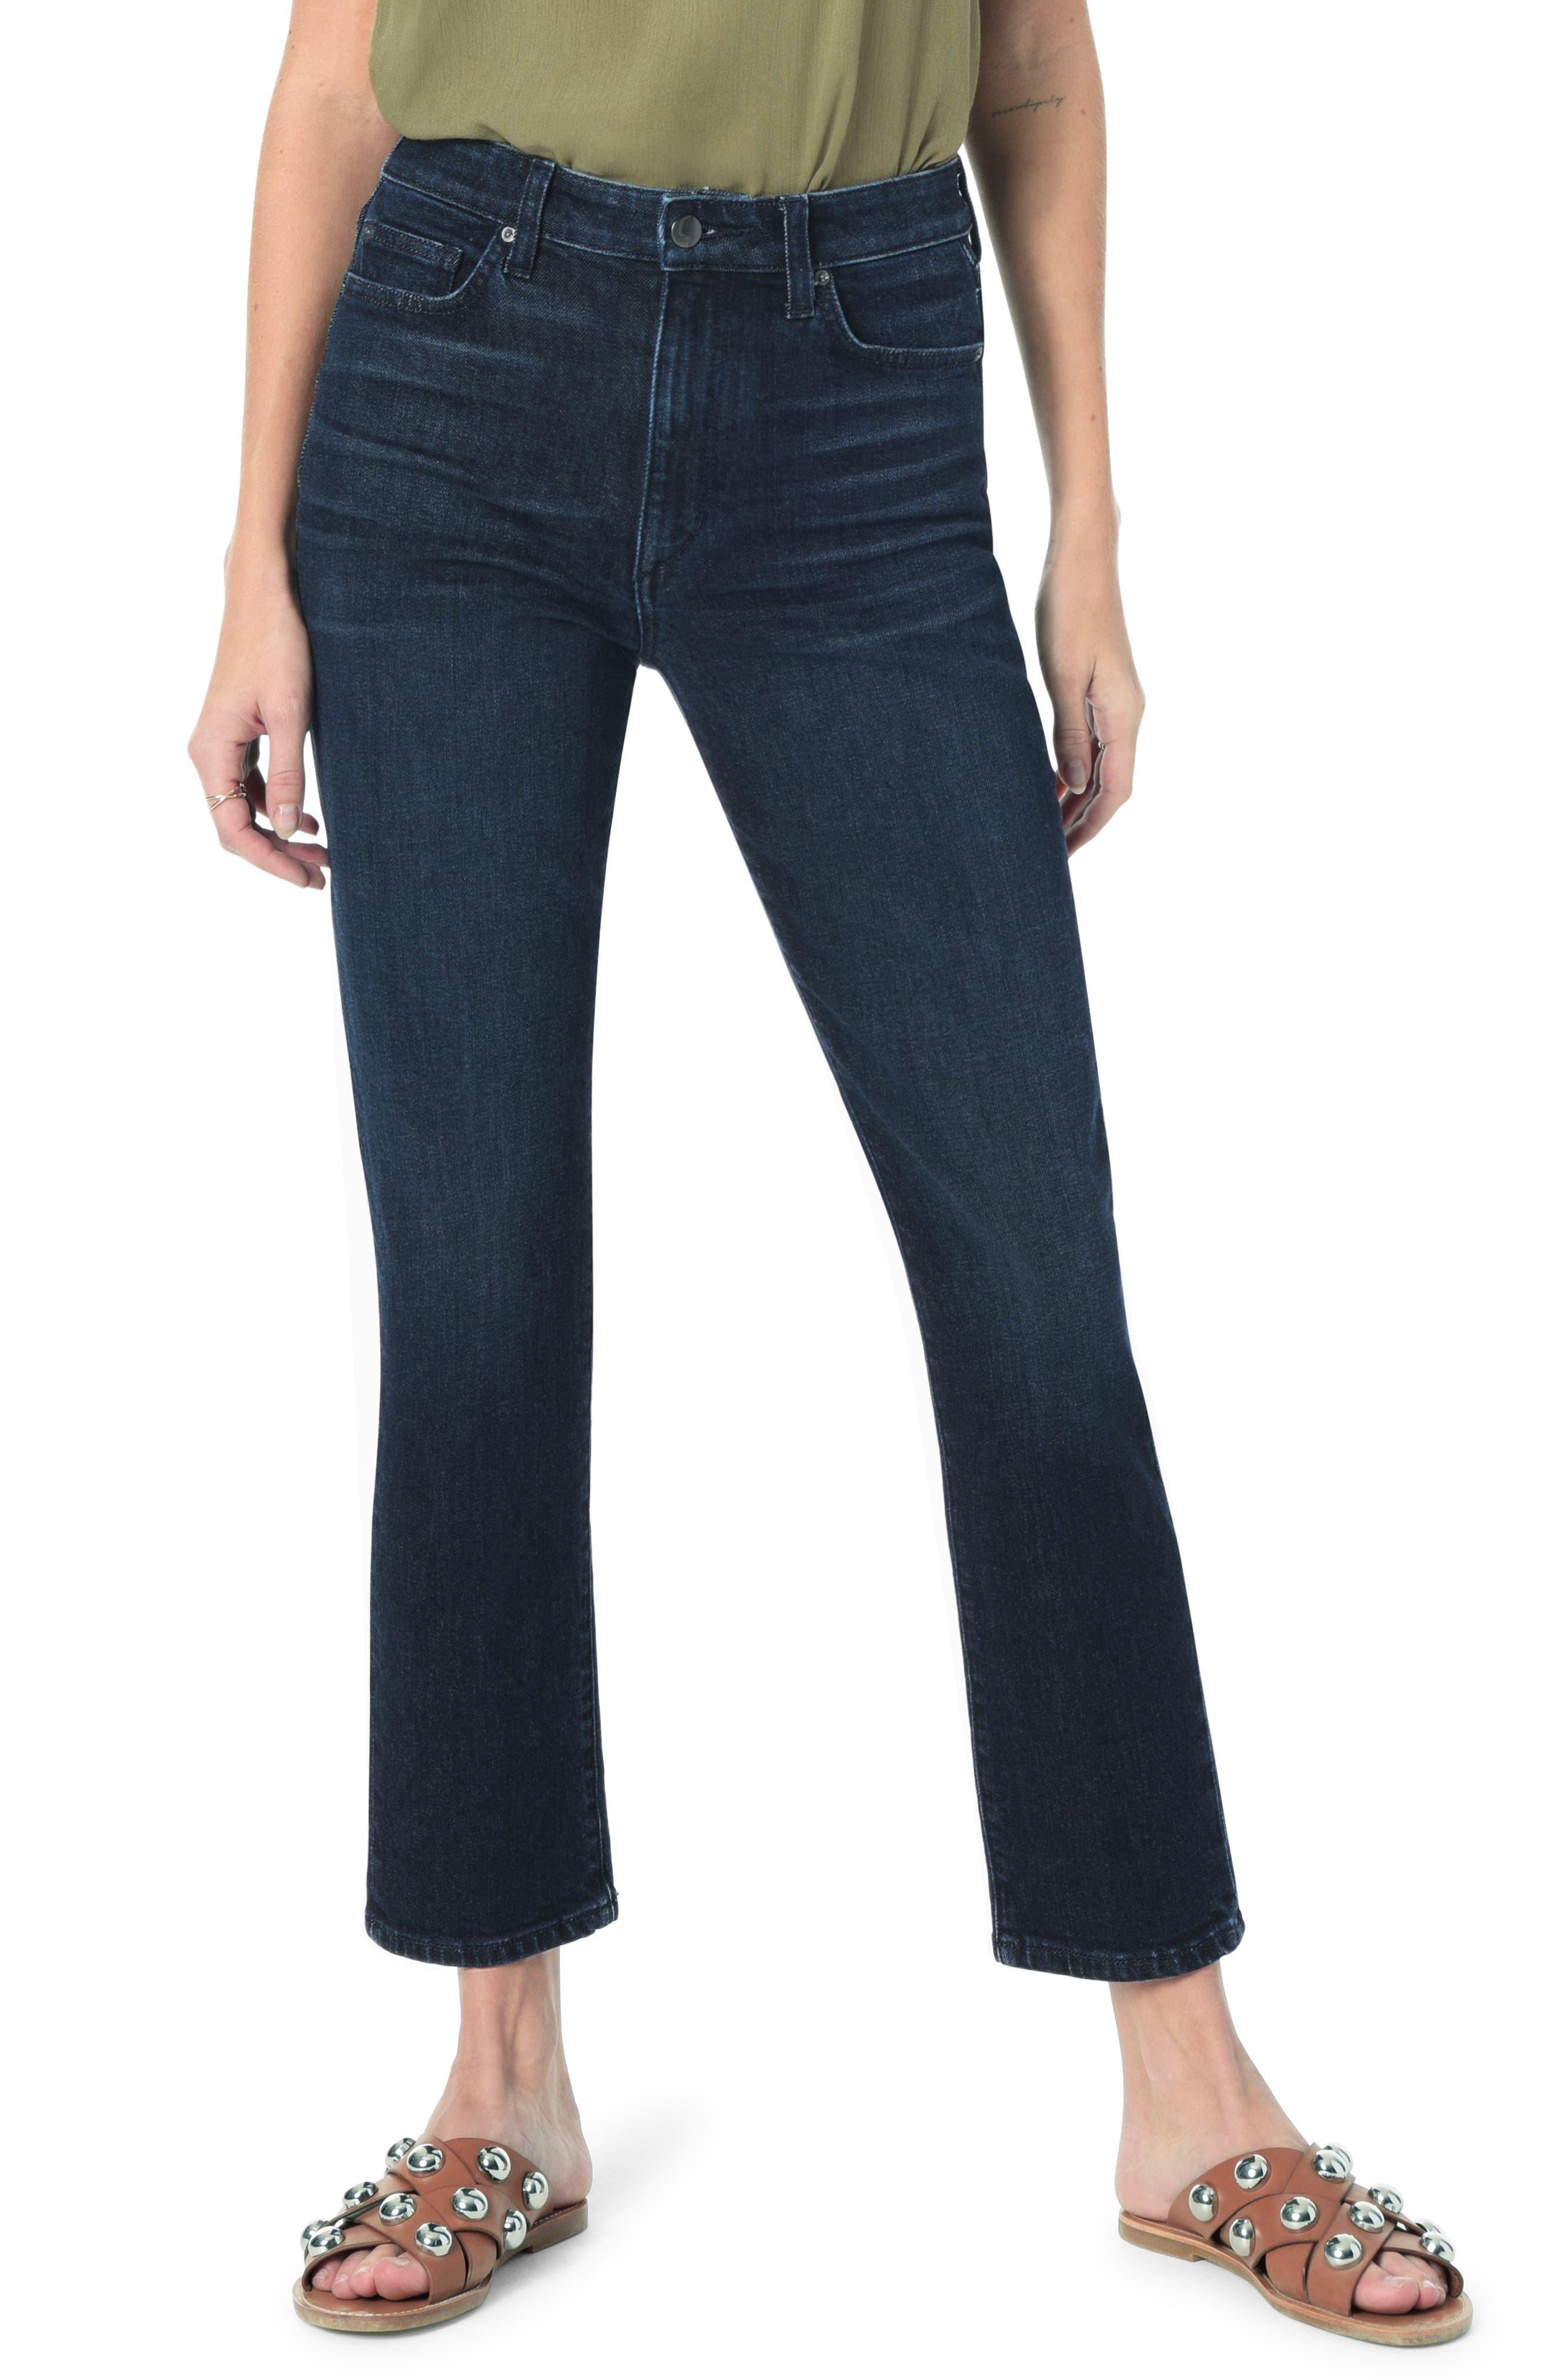 JOE'S Milla Ankle Jeans, Main, color, JOJO